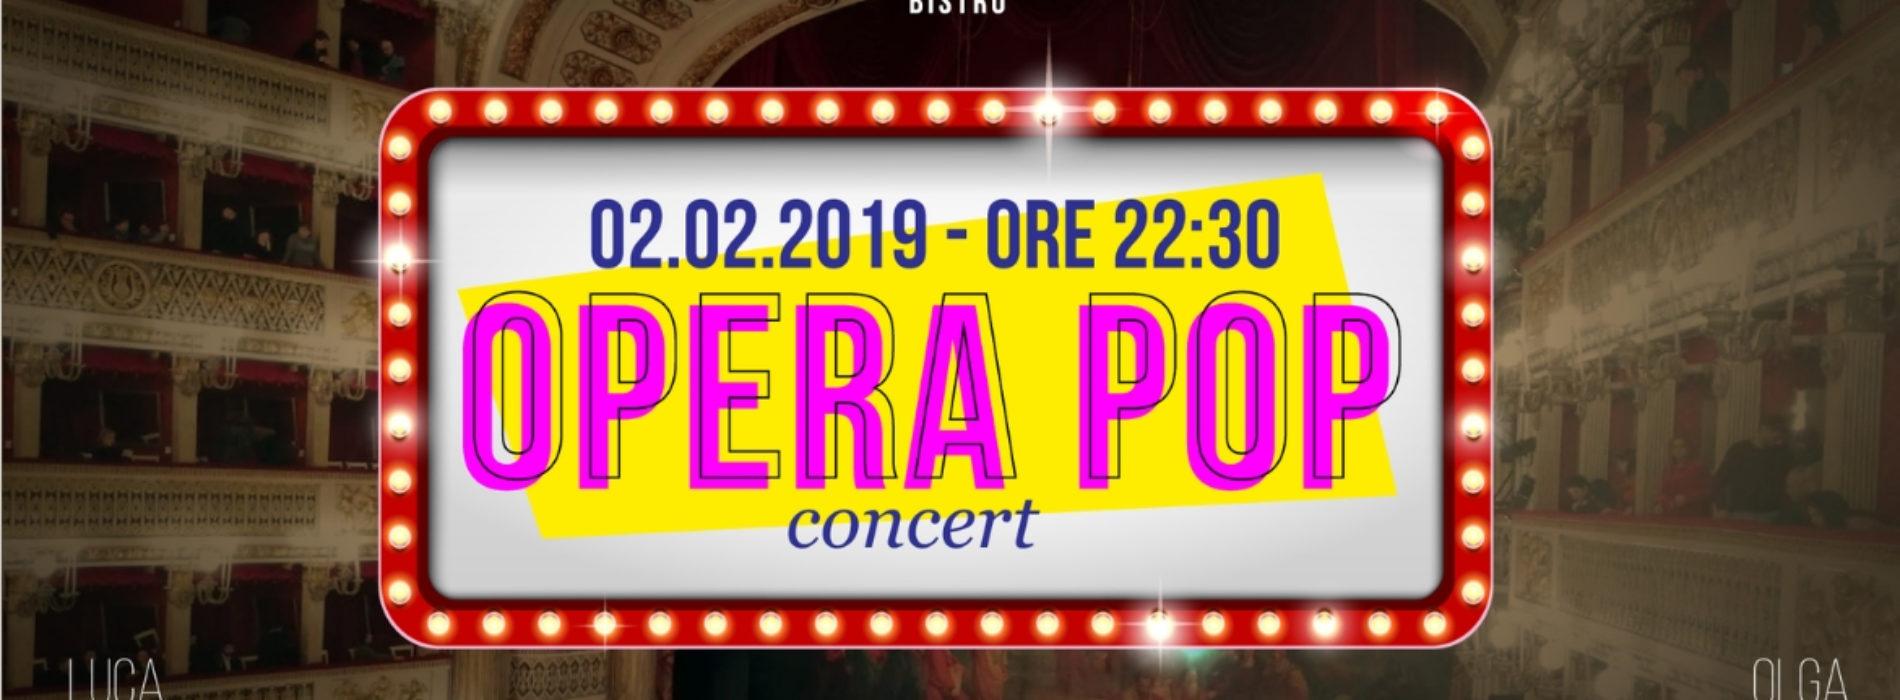 Opera Pop Concert al Common Ground